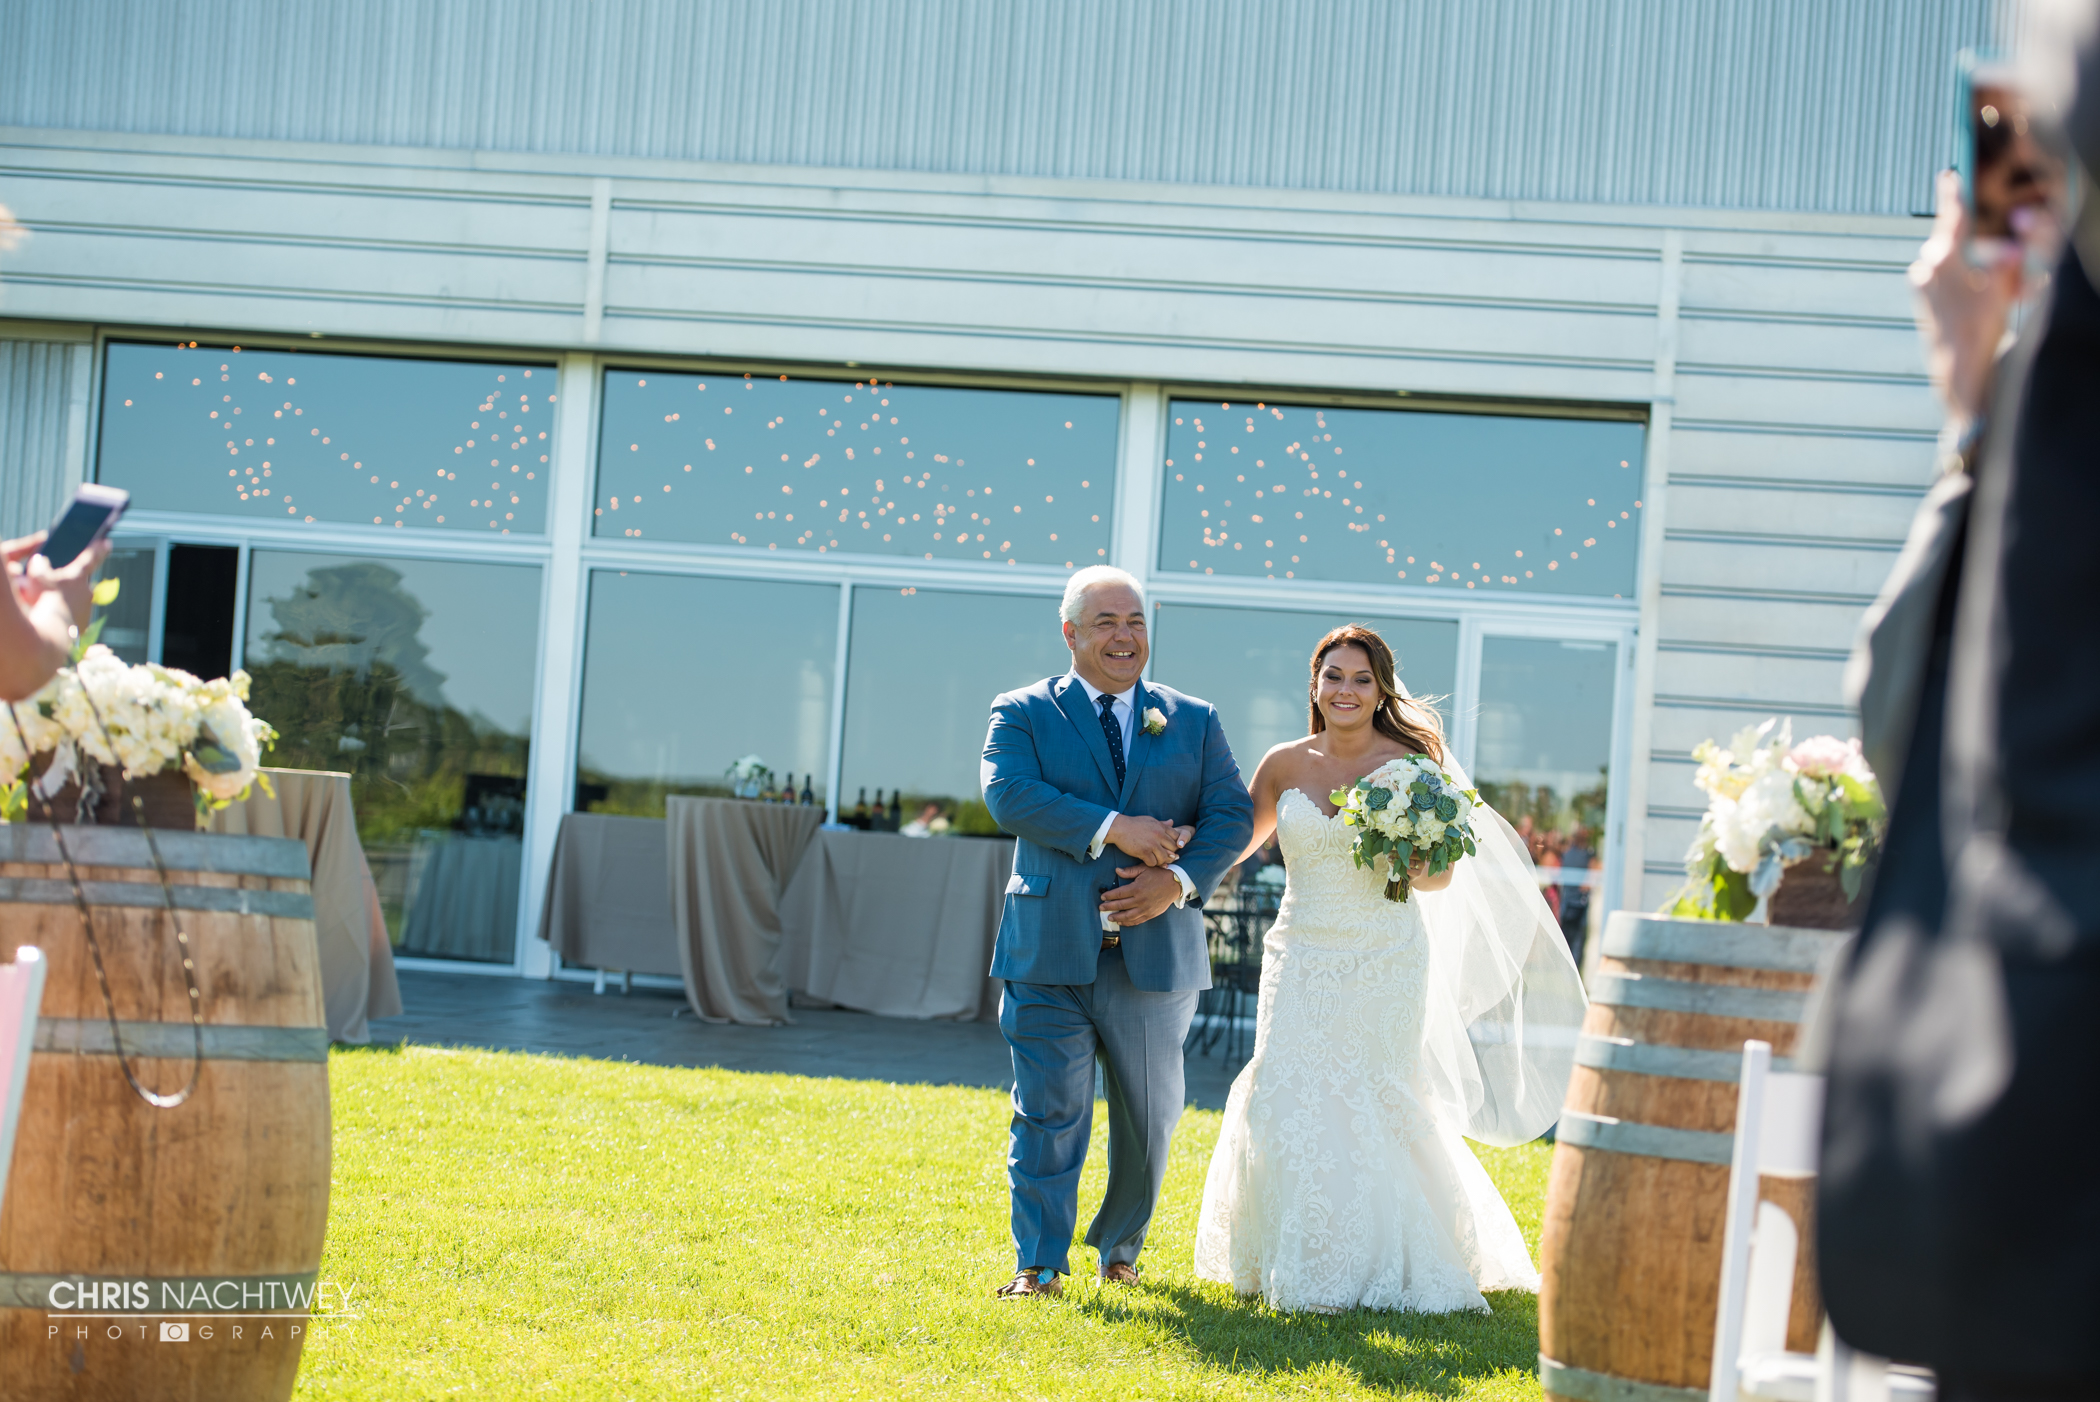 saltwater-farm-vineyard-wedding-photos-lindsay-gabe-chris-nachtwey-photography-2017-33.jpg